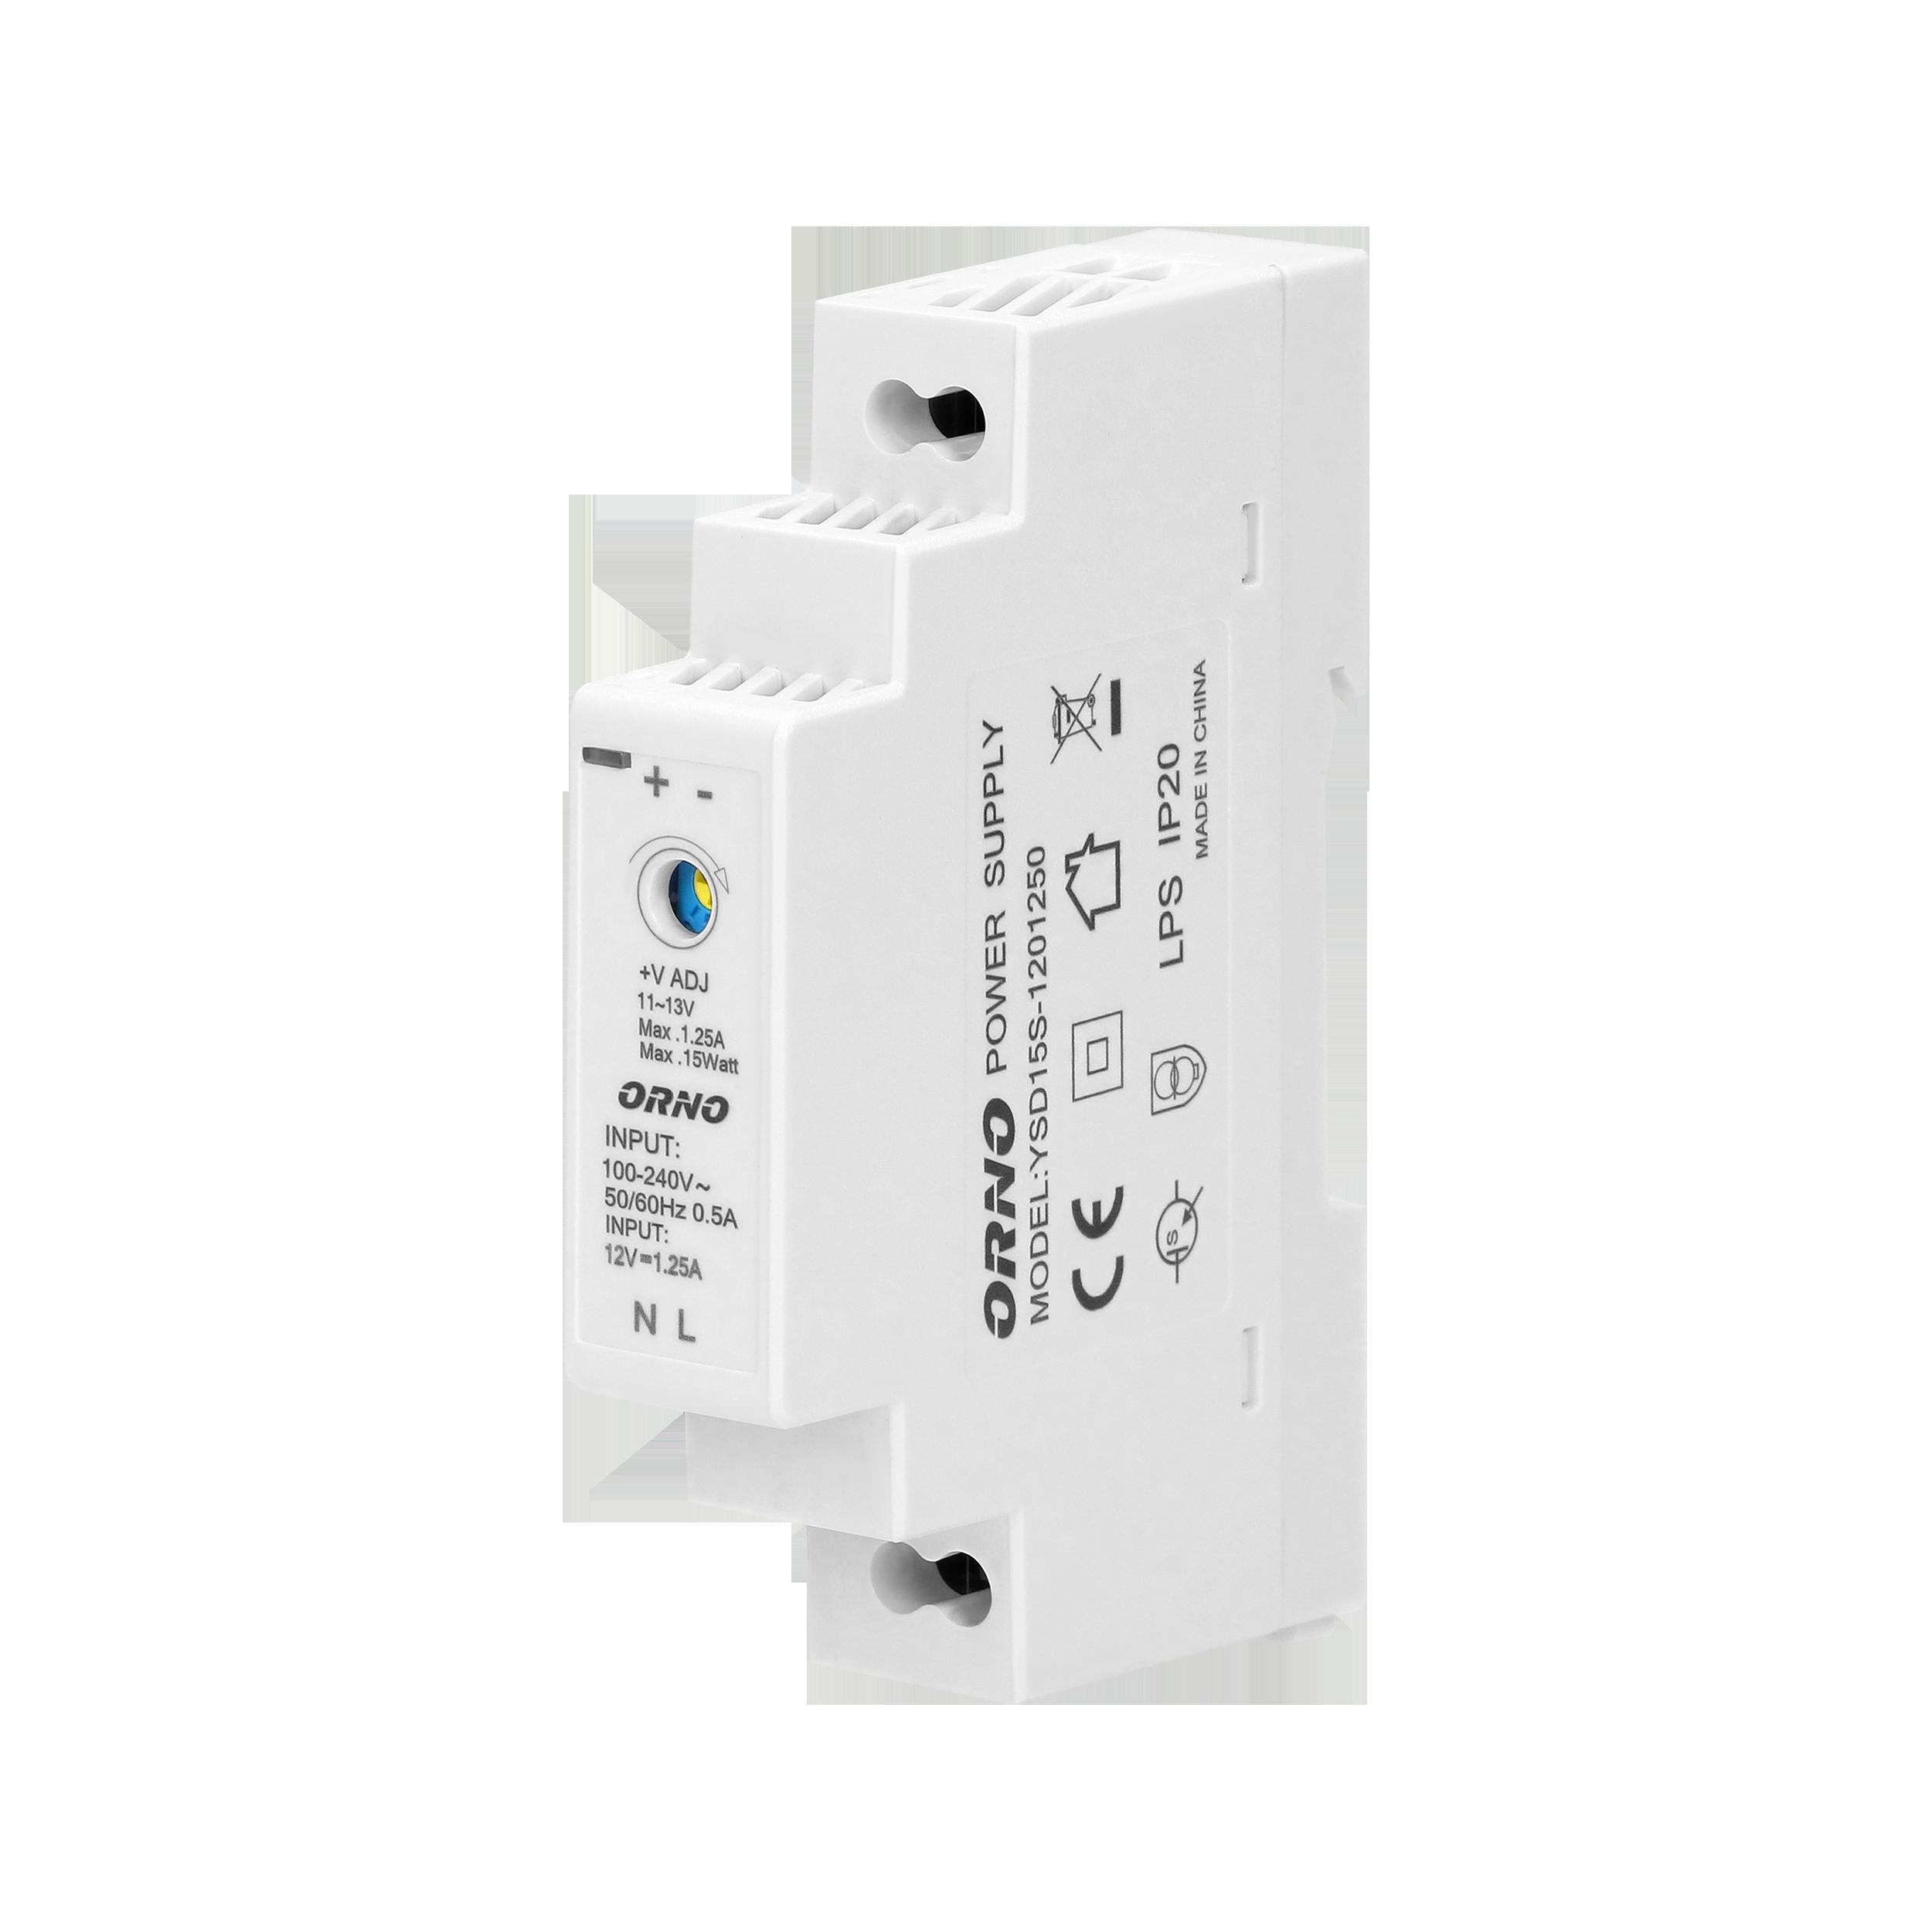 DIN rail power adaptor 12V DC 1.25A, 15W, width: 1 unit